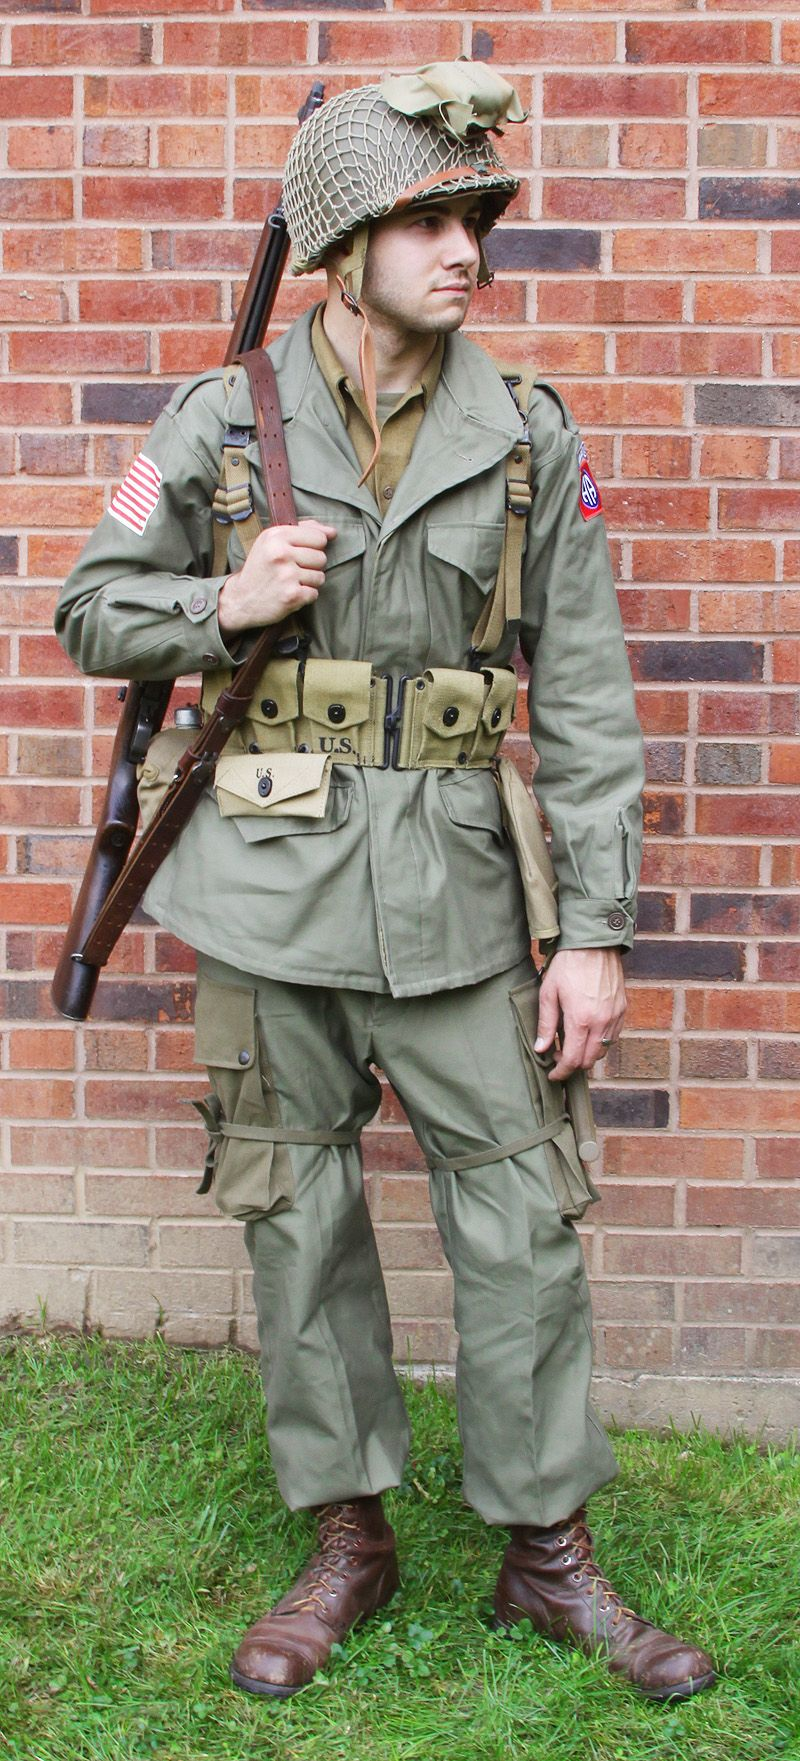 Image result for m-1943 combat field uniform | U.S ... - photo #50